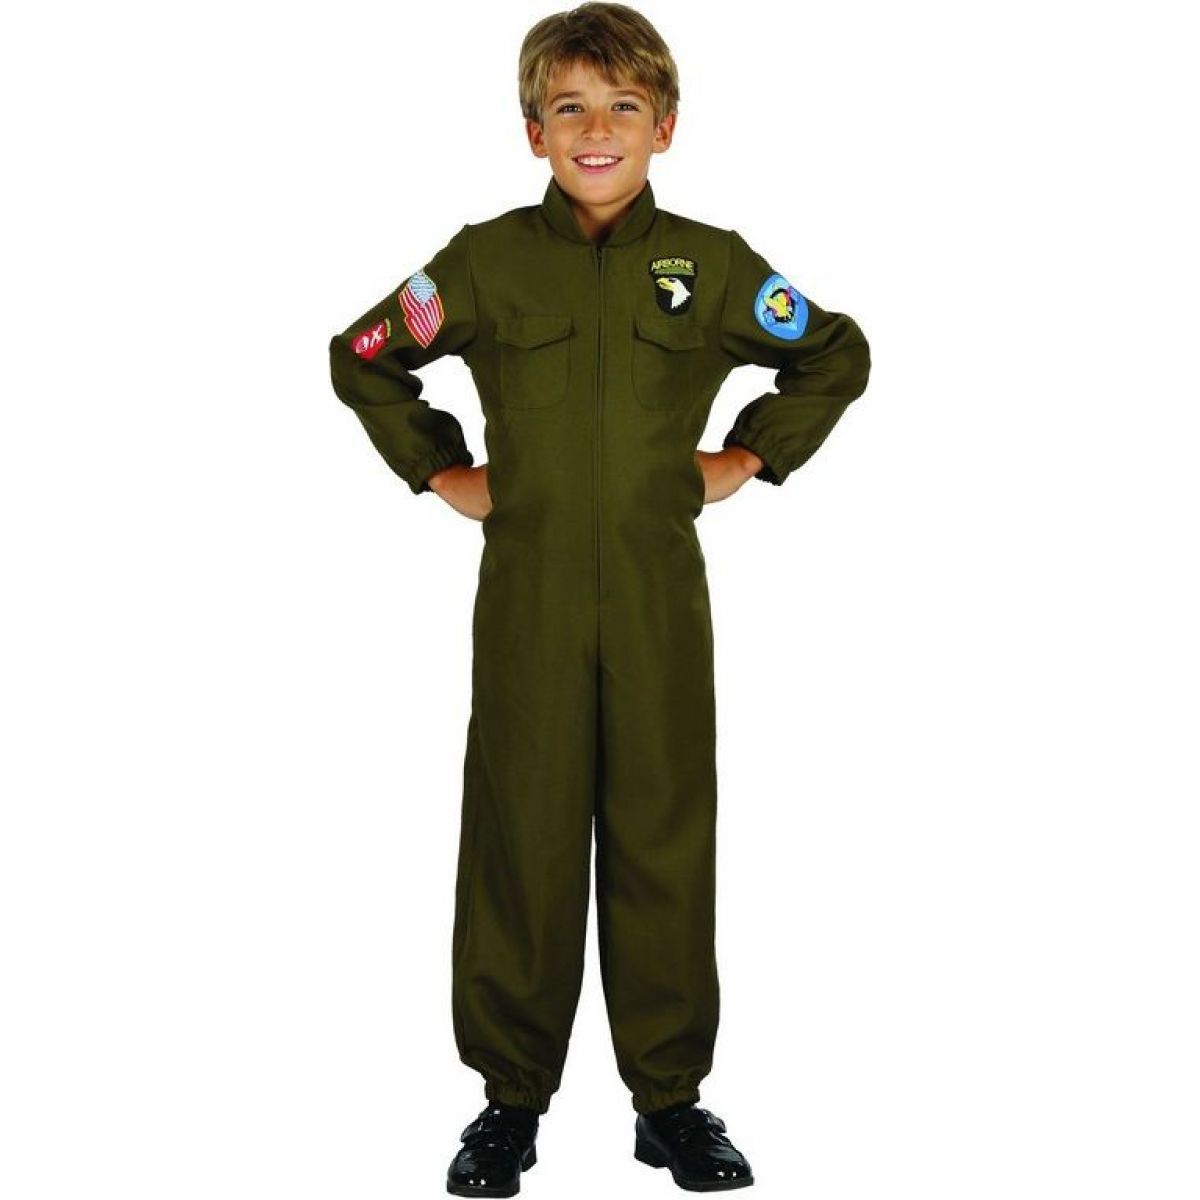 Dětský karnevalový kostým Pilot 120-130 cm